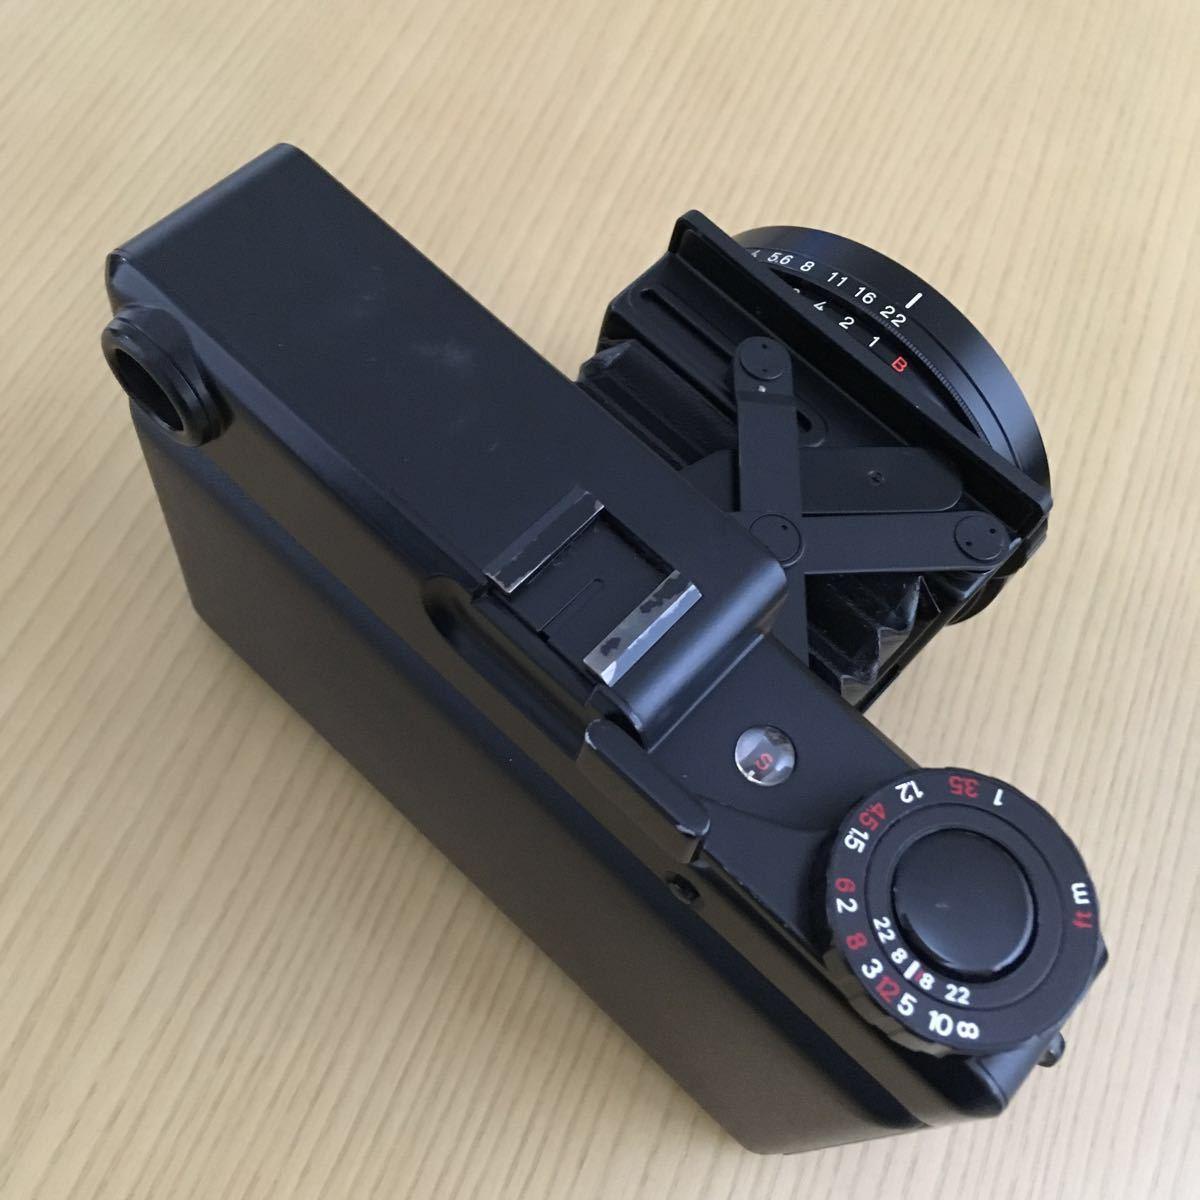 PLAUBEL makina 67 (Nikon Nikkor 80mm f2.8)プラウベル・マキナ 中判カメラ 完動品 シャッター切れスピード変化し露出計も動作しました。_画像4